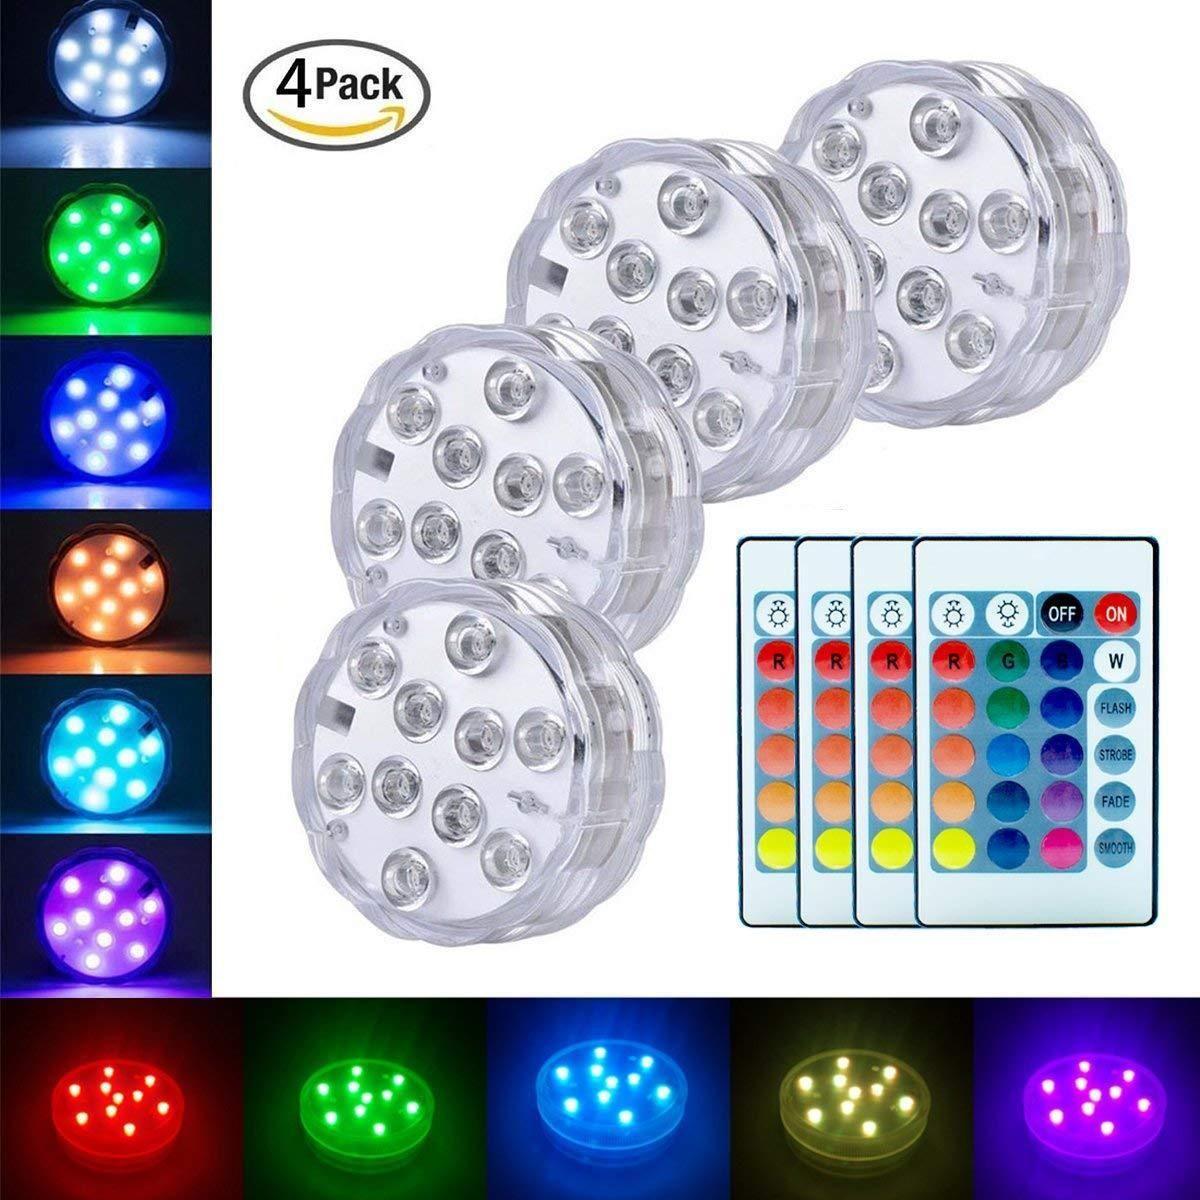 Luces LED sumergibles Luces puntuales a batería con lámparas pequeñas remotas Pescado